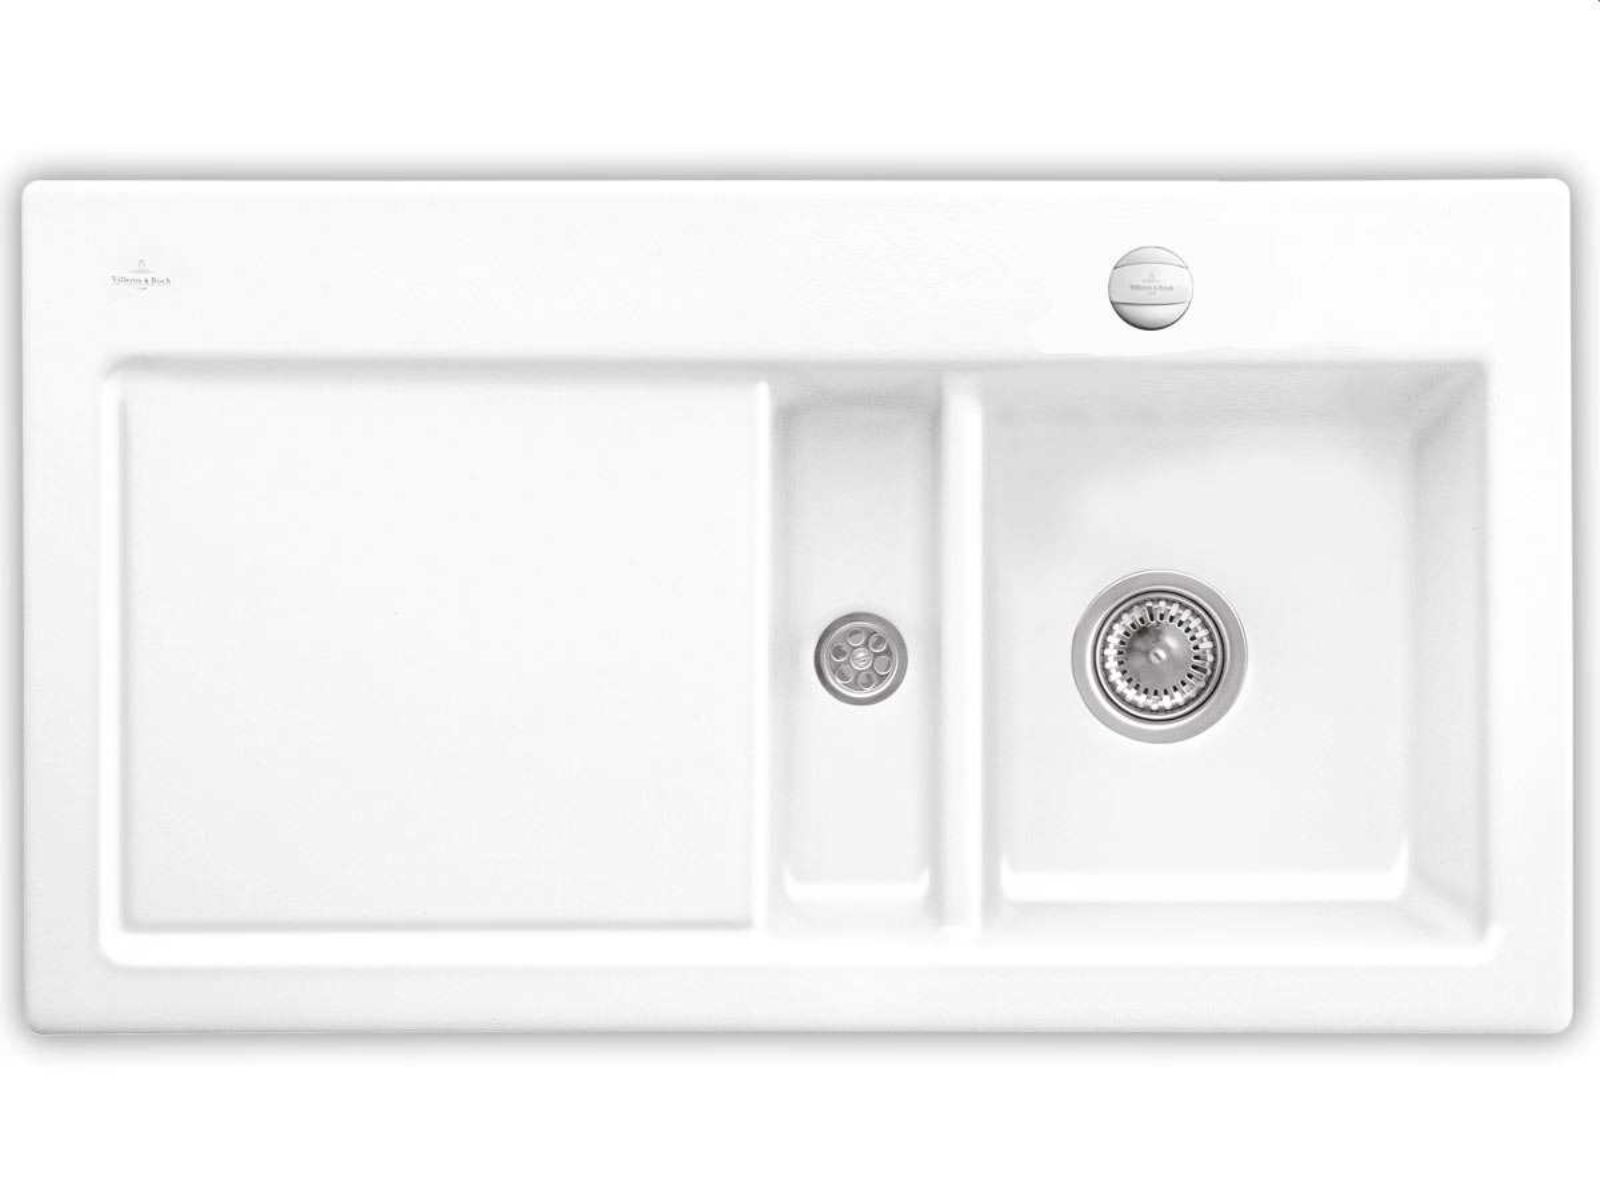 Villeroy & Boch Subway 50 Weiß (alpin) - 6713 02 R1 Keramikspüle Exzenterbetätigung